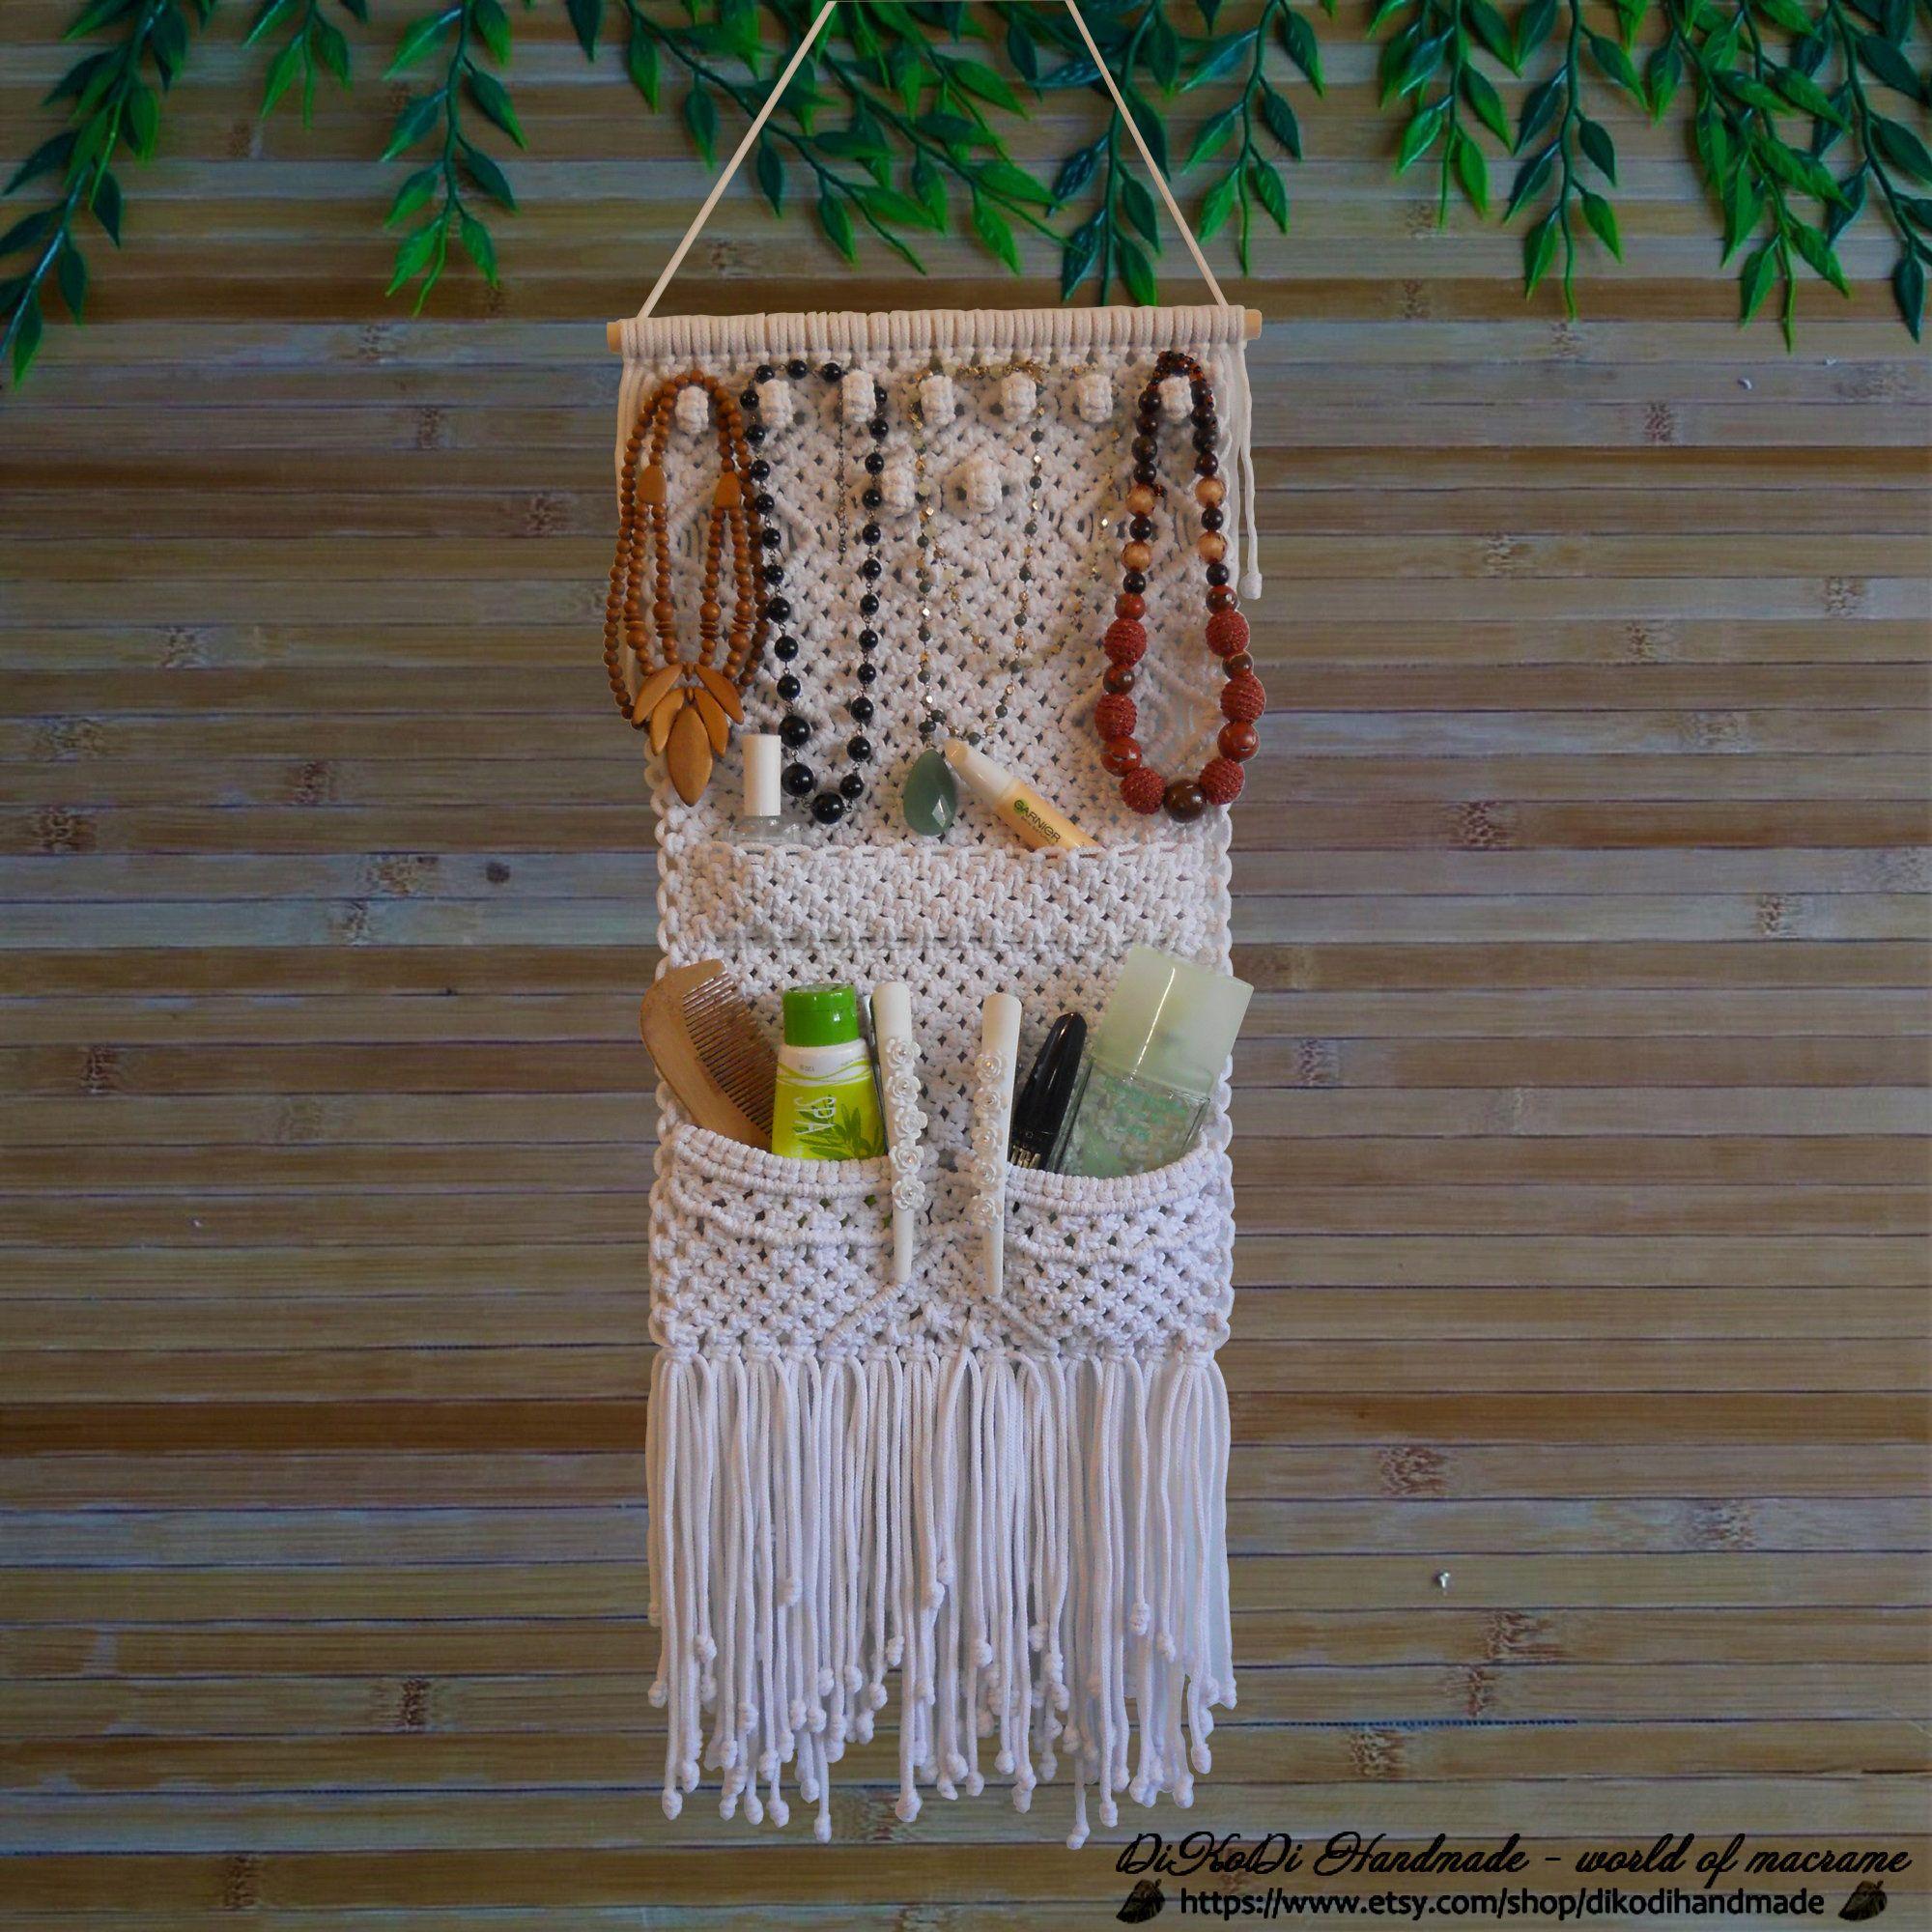 Hanging jewellery organiser, Home organization pro